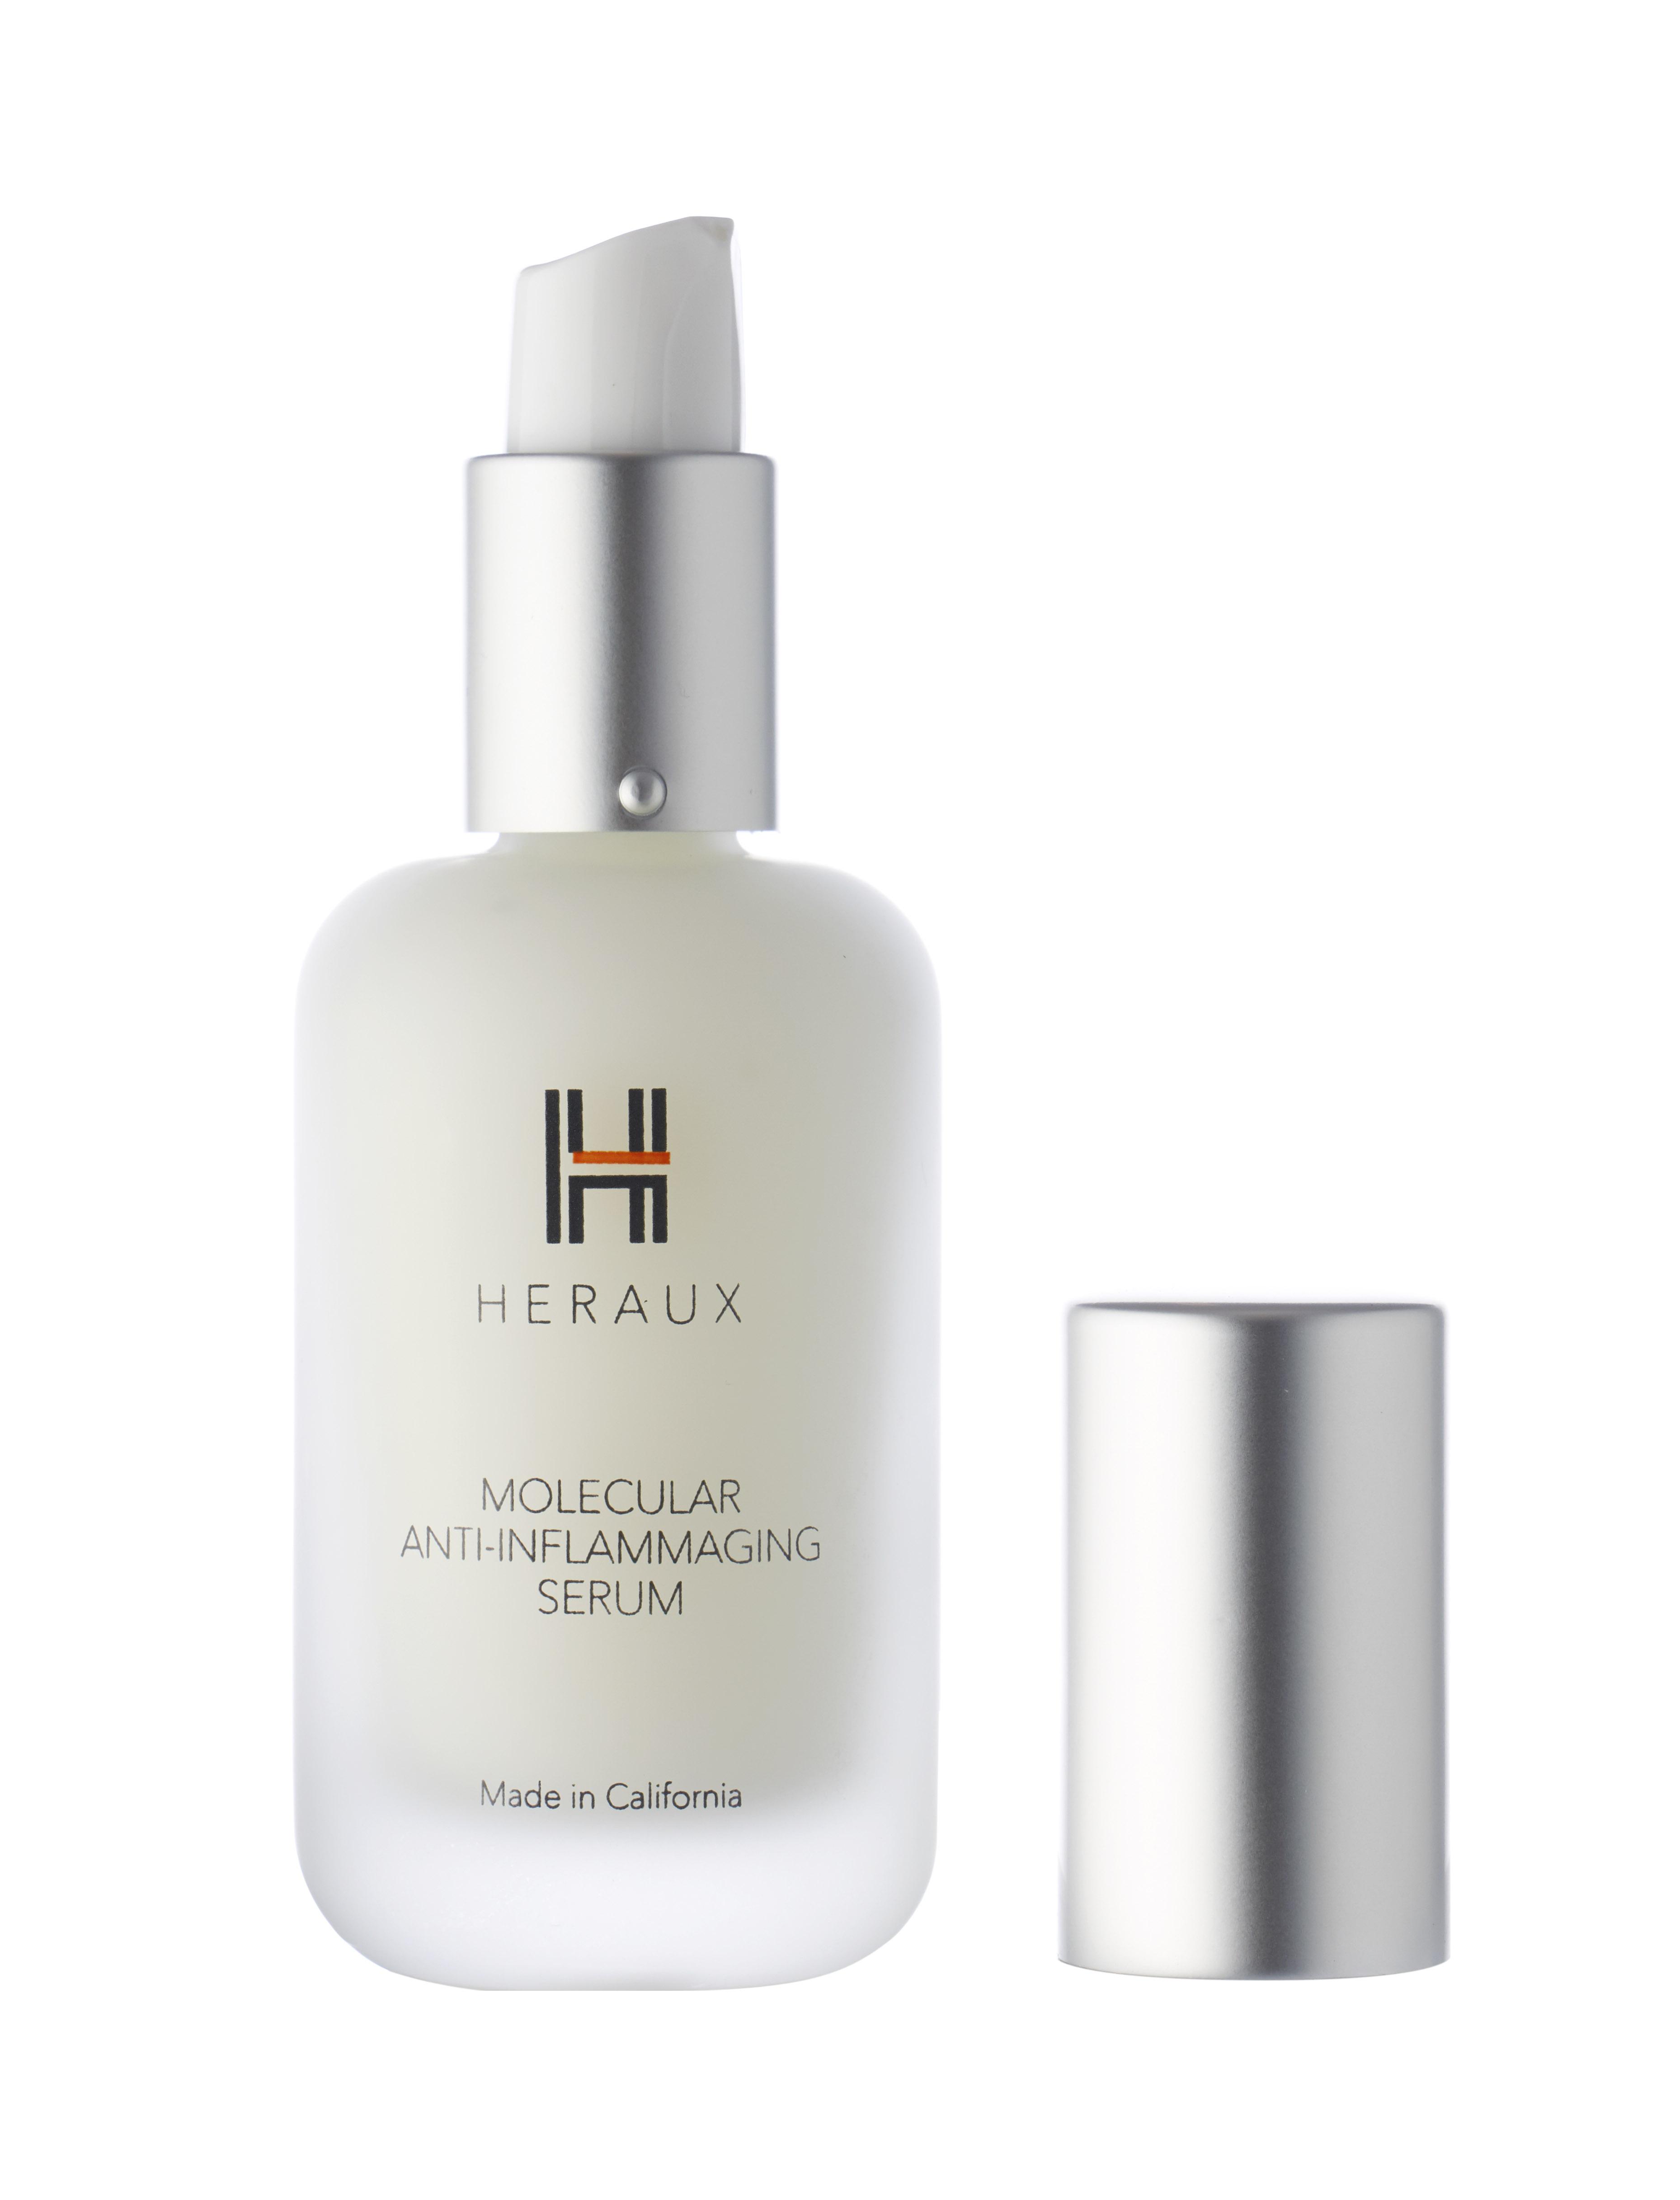 Heraux Molecular Anti-Inflammaging Serum; best anti-aging products for men